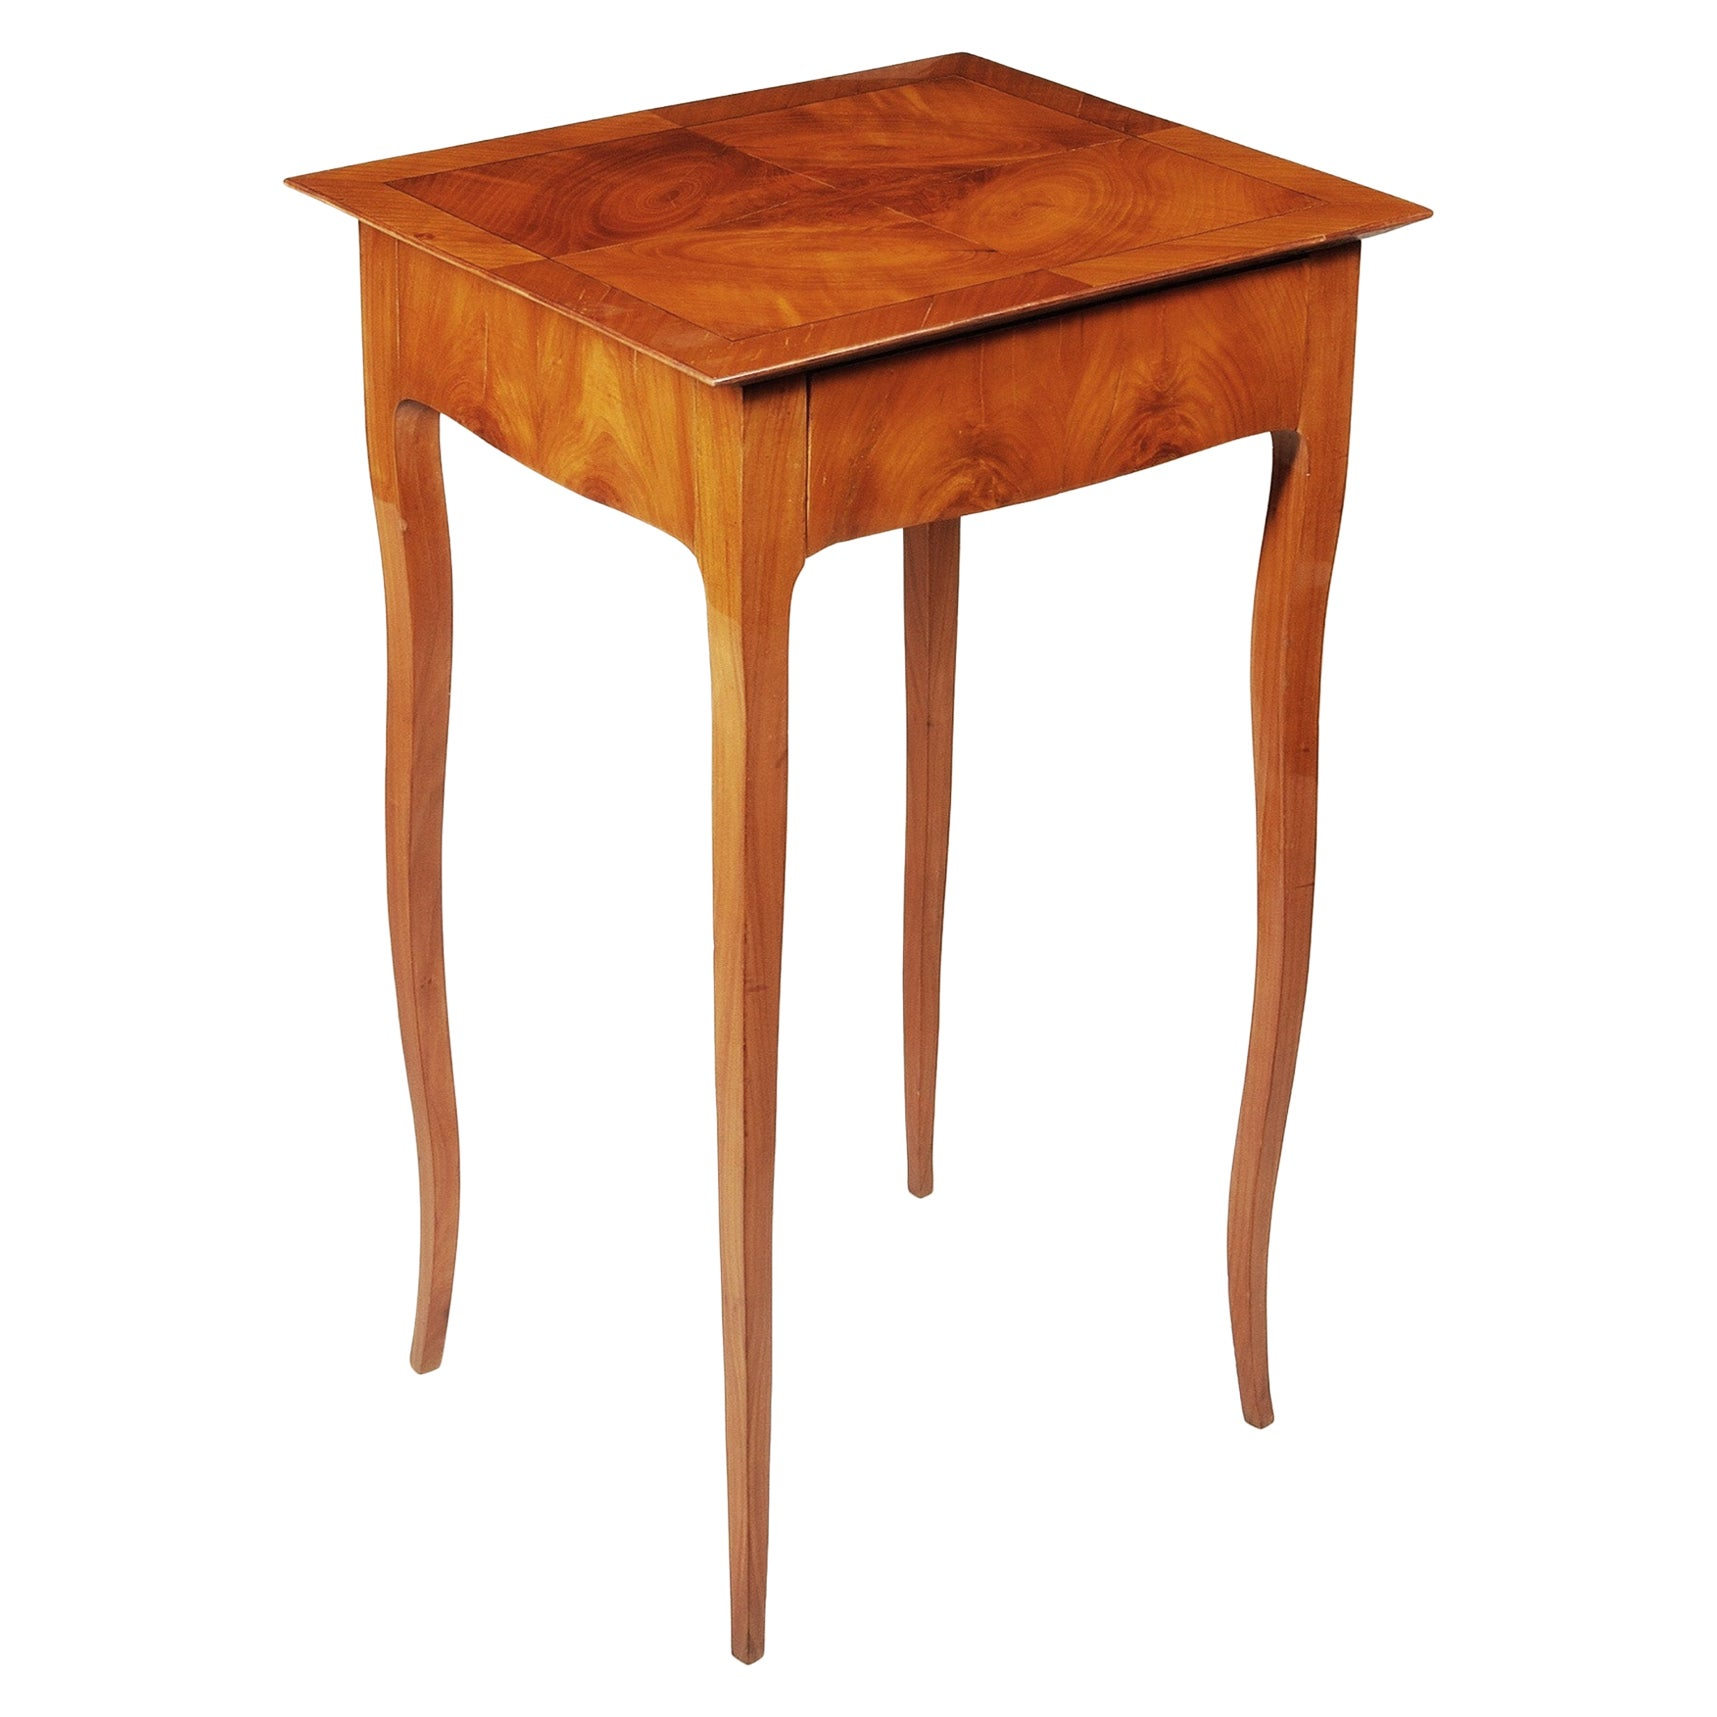 Small Cherry Biedermeier Side Table, France 1840-1849, Shellac Polished